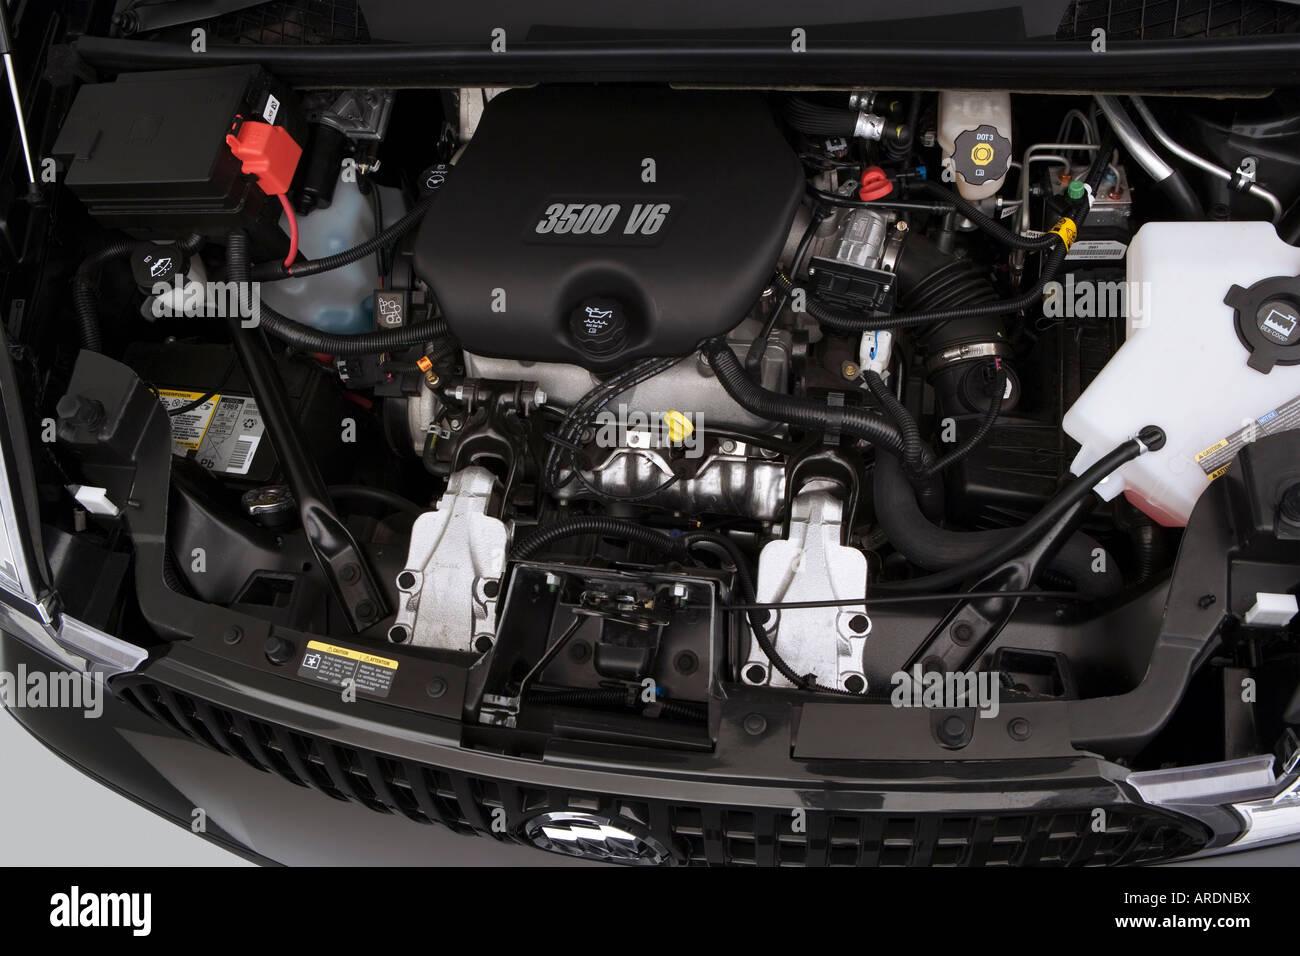 2007 Buick Rendezvous CXL In Black